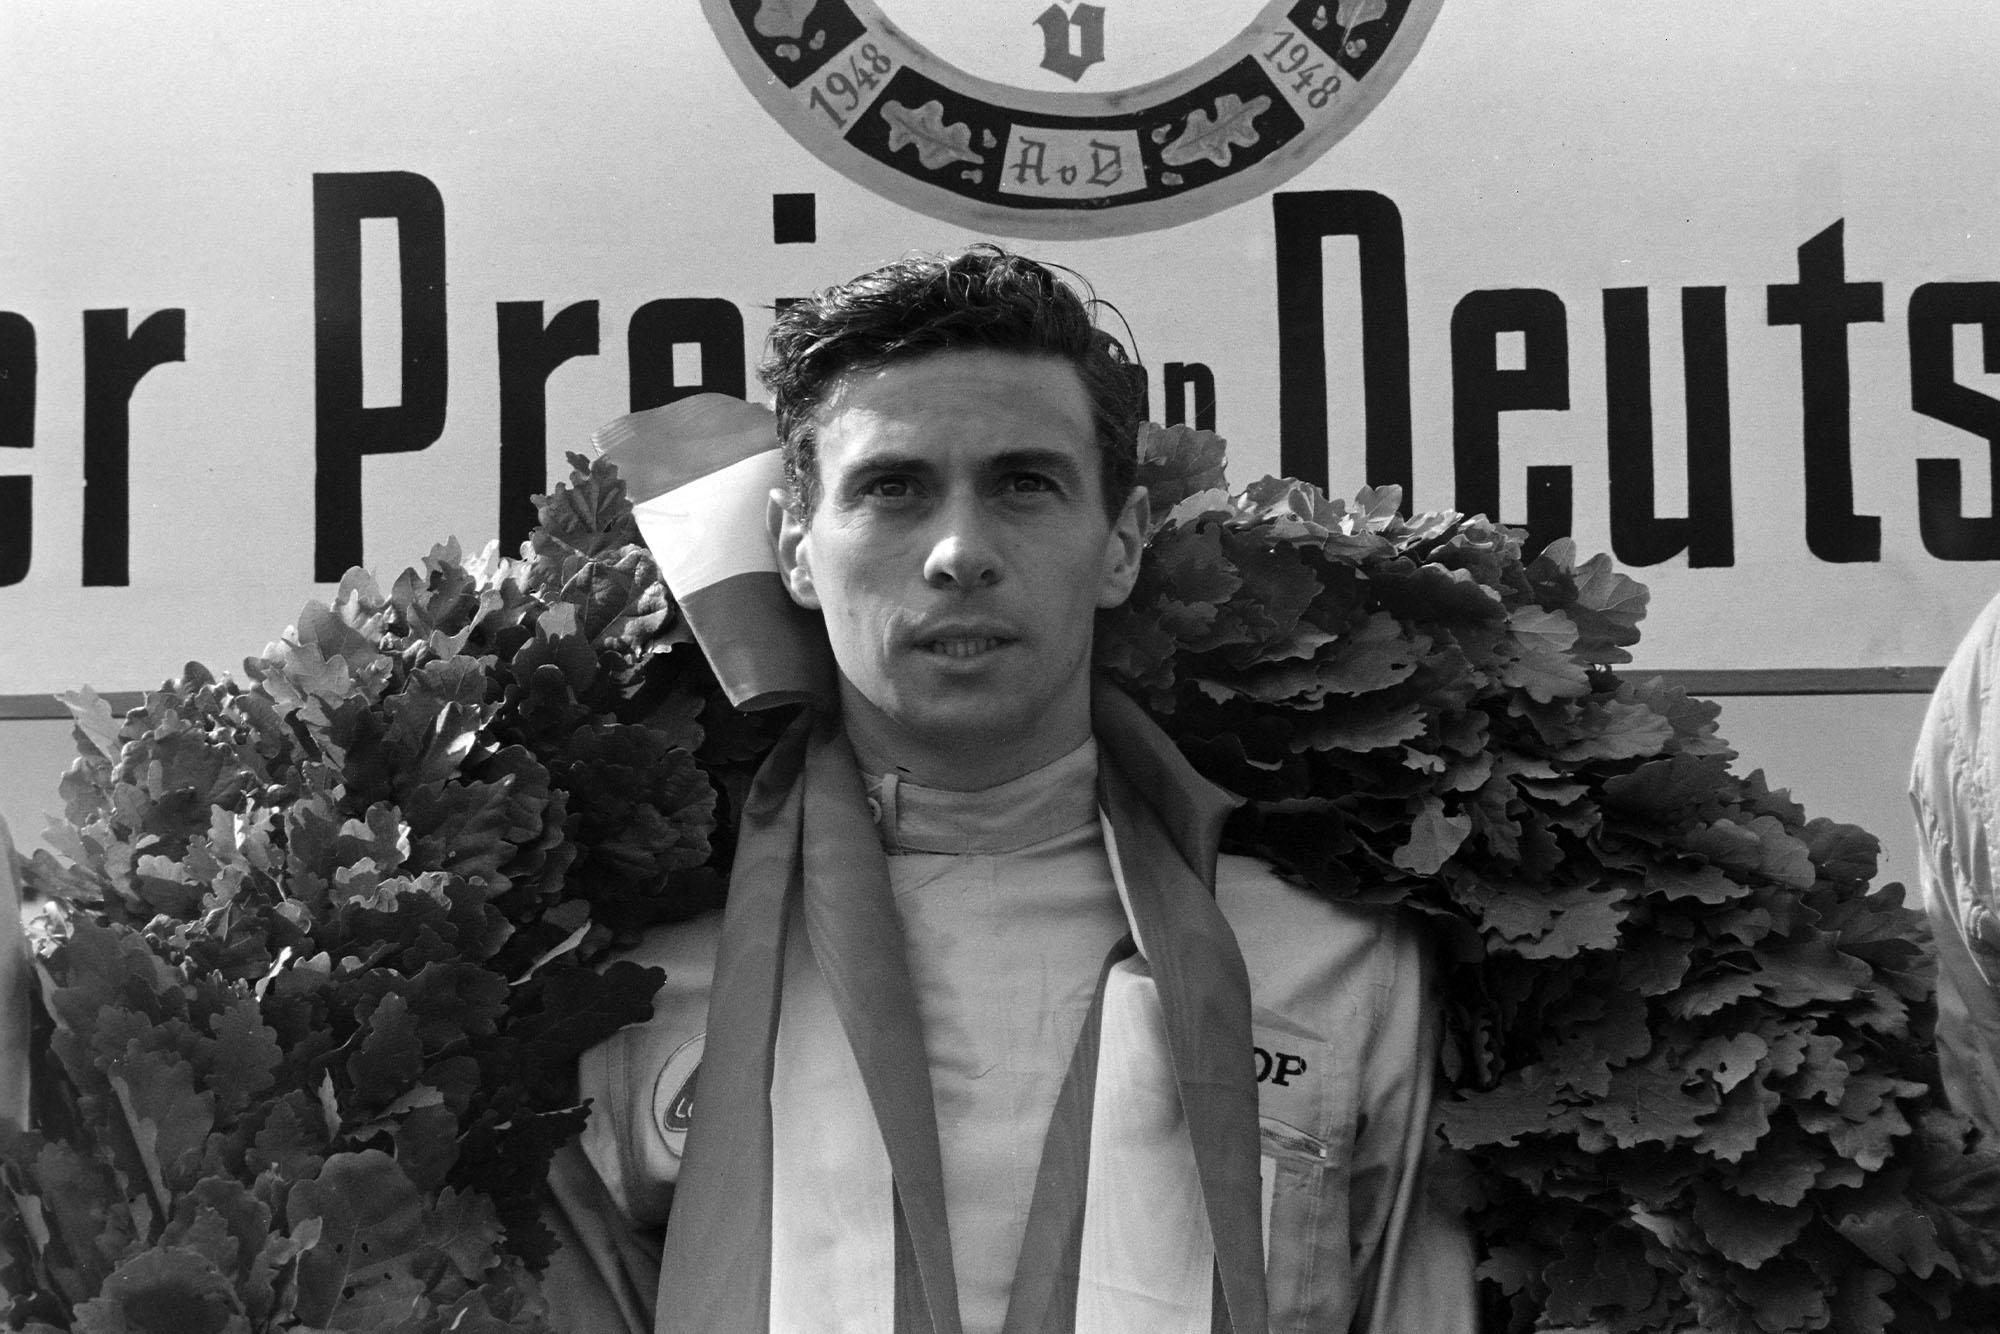 Jim Clark, 1st position, on the podium.